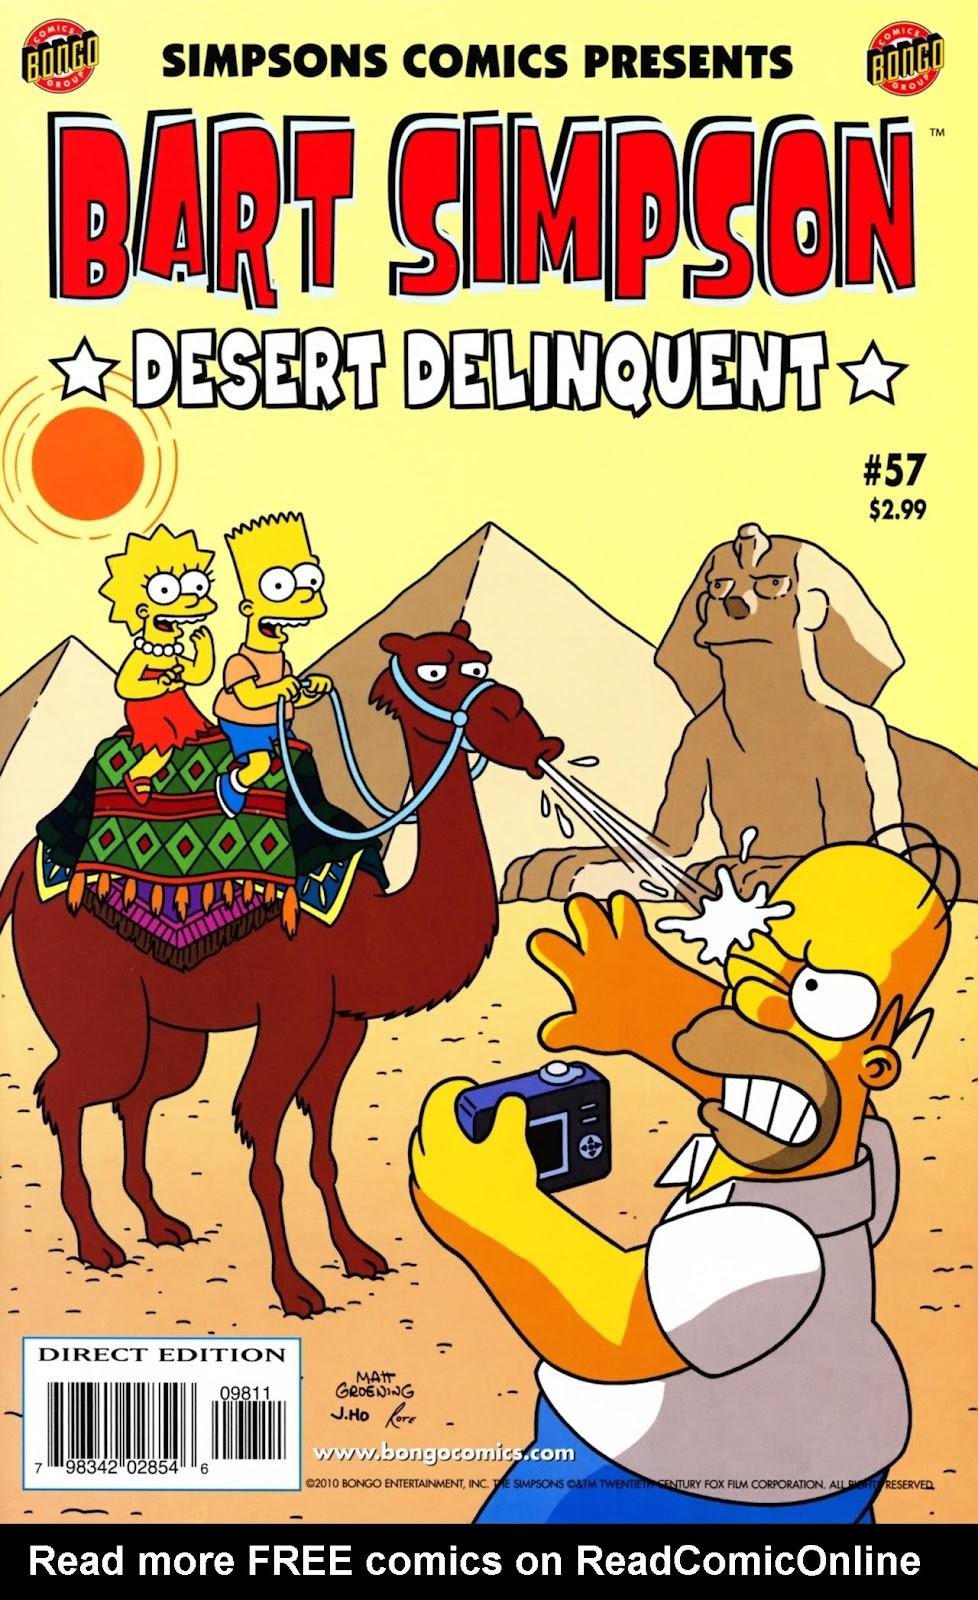 Simpsons Comics Presents Bart Simpson 57 Page 1